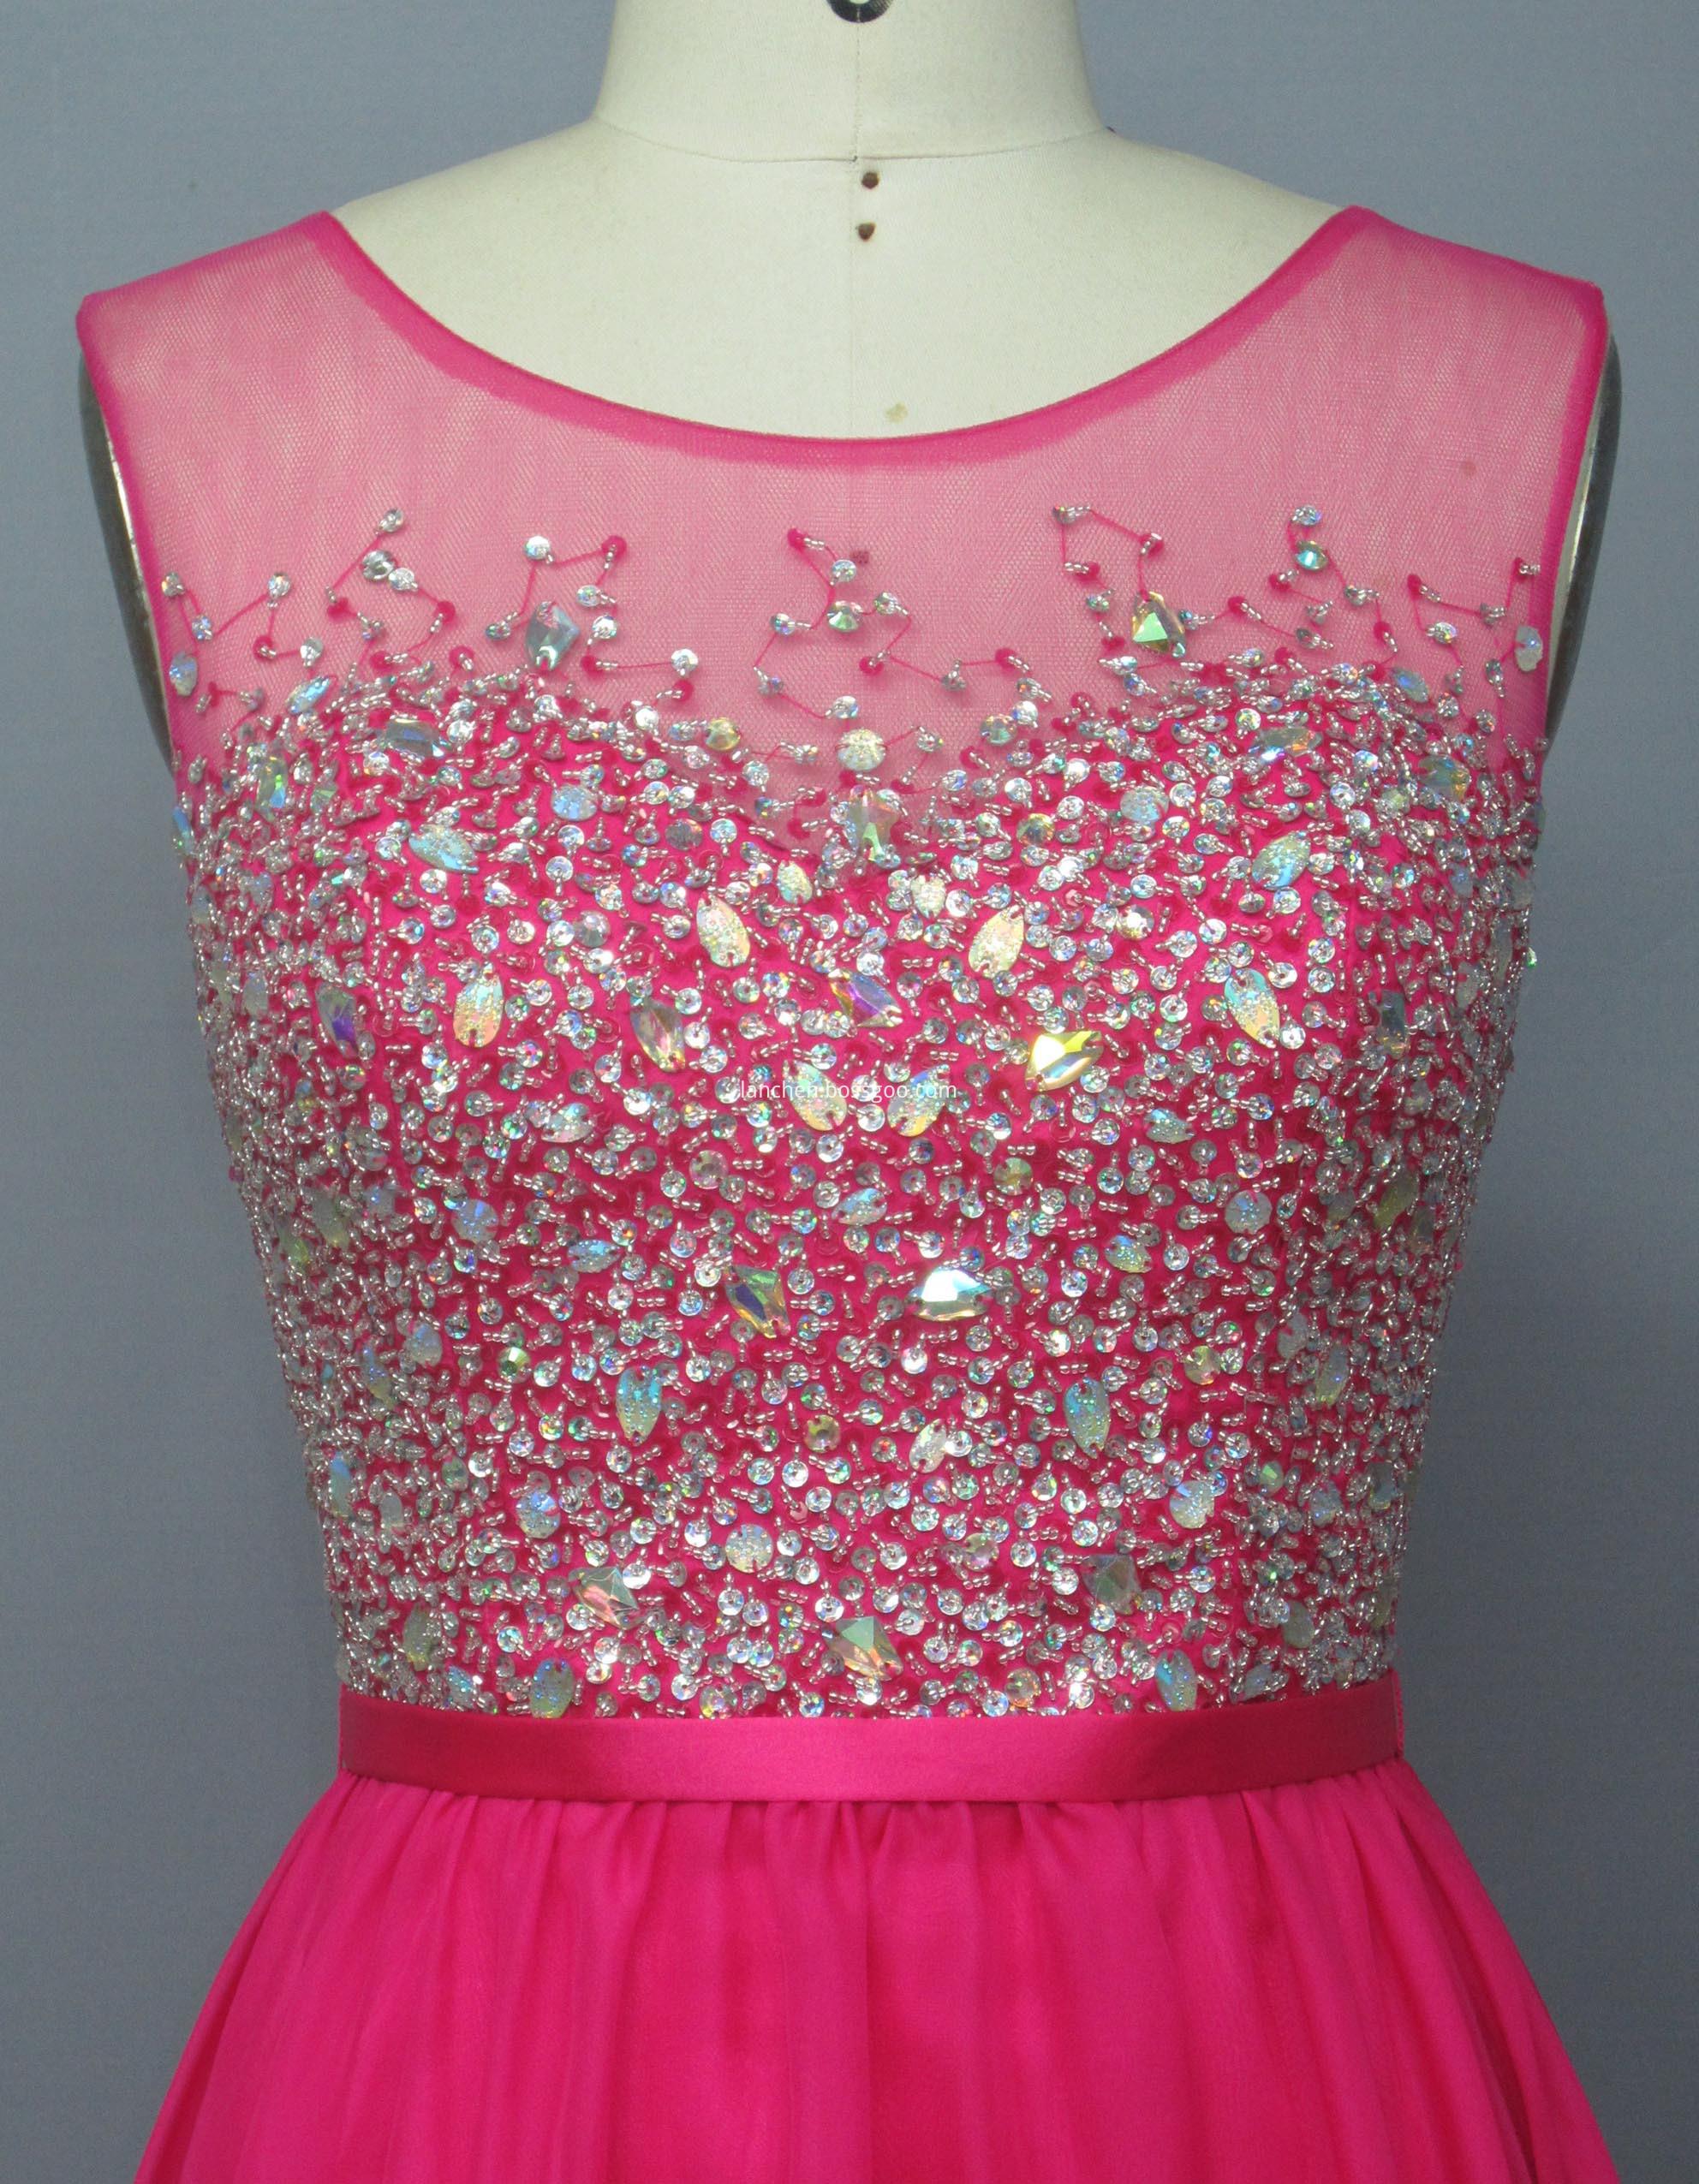 Illusion Short Neckline Dress